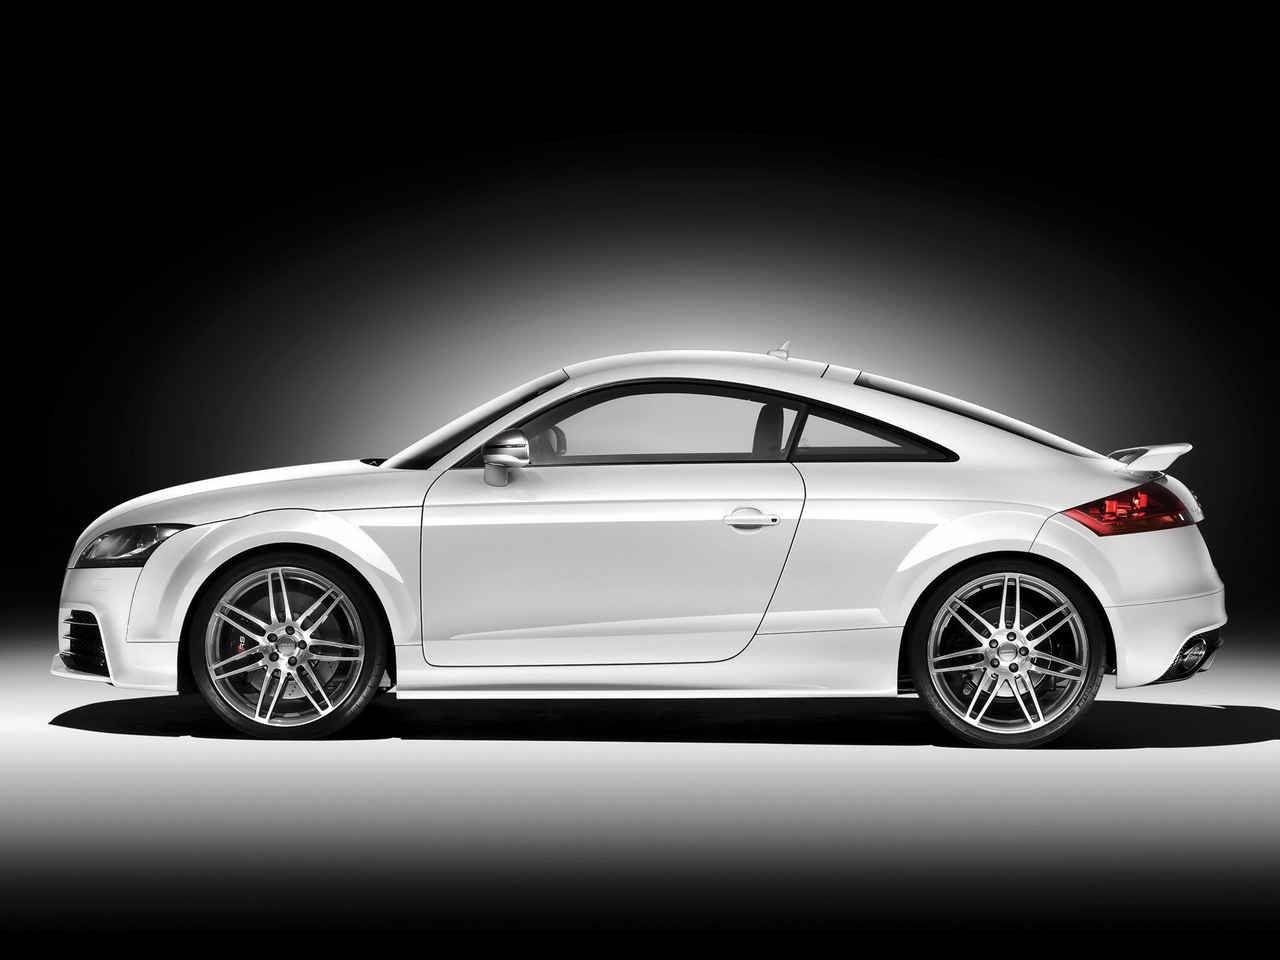 Audi TT RS Wallpapers HD Download 1280x960